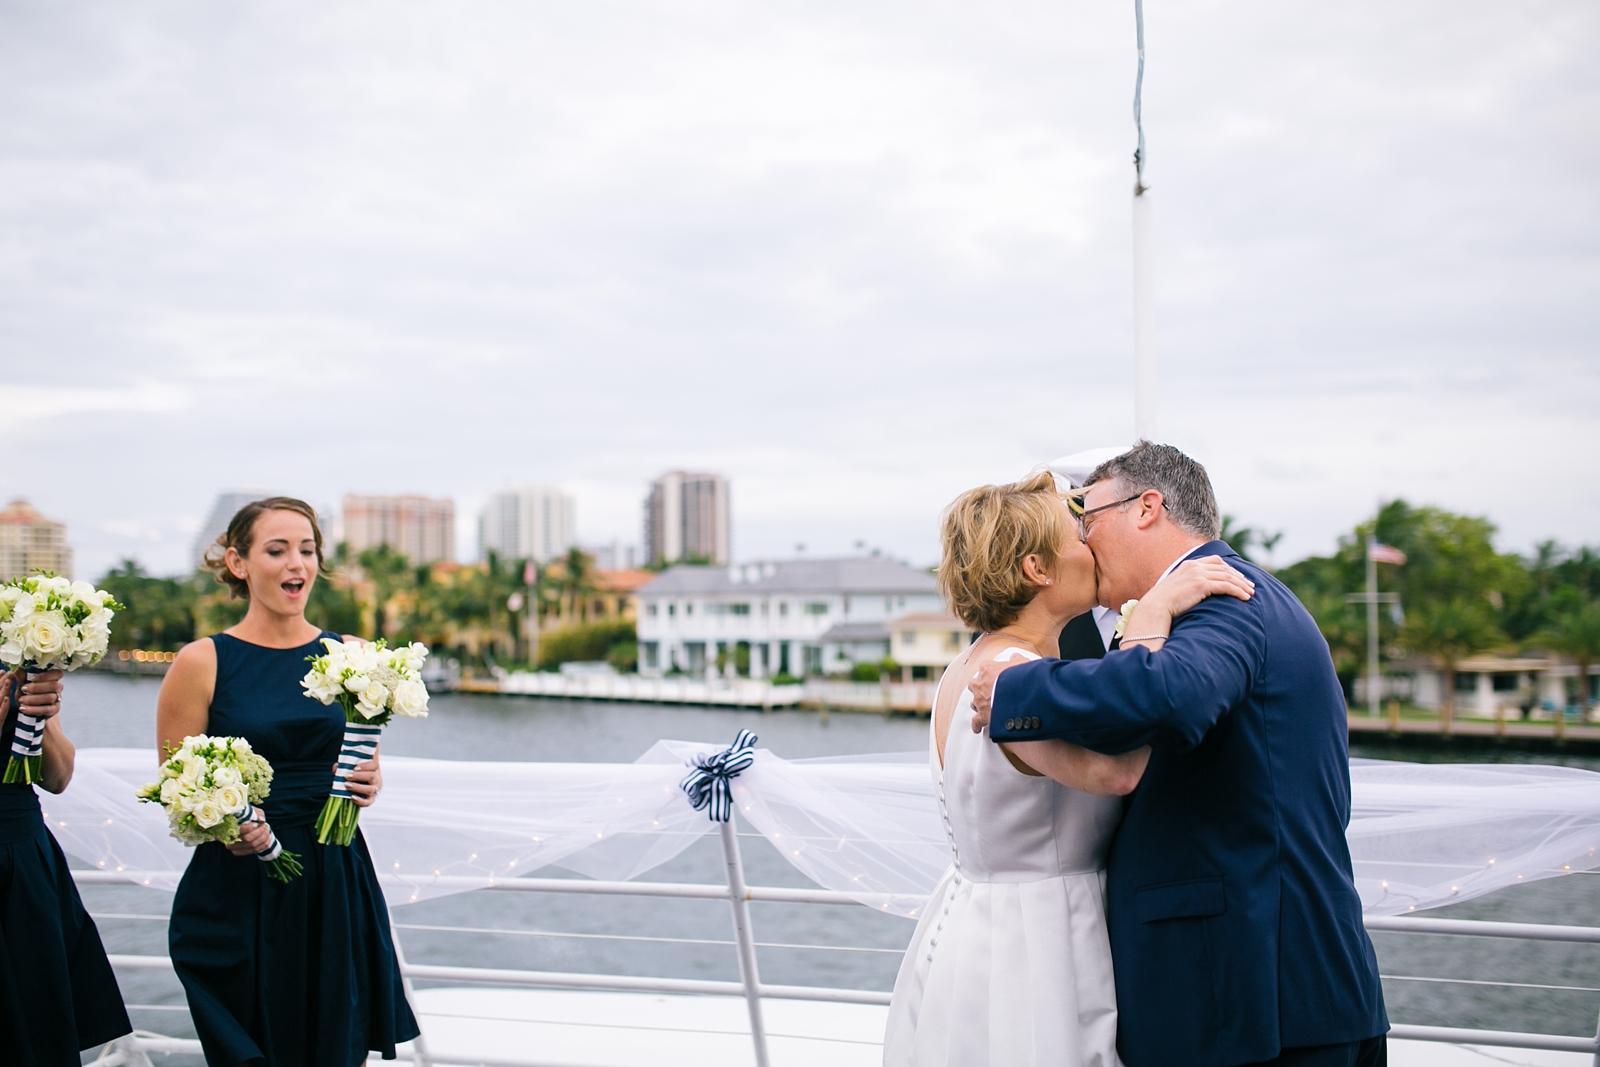 47-los-angeles-wedding-photographer-fort-lauderdale.jpg